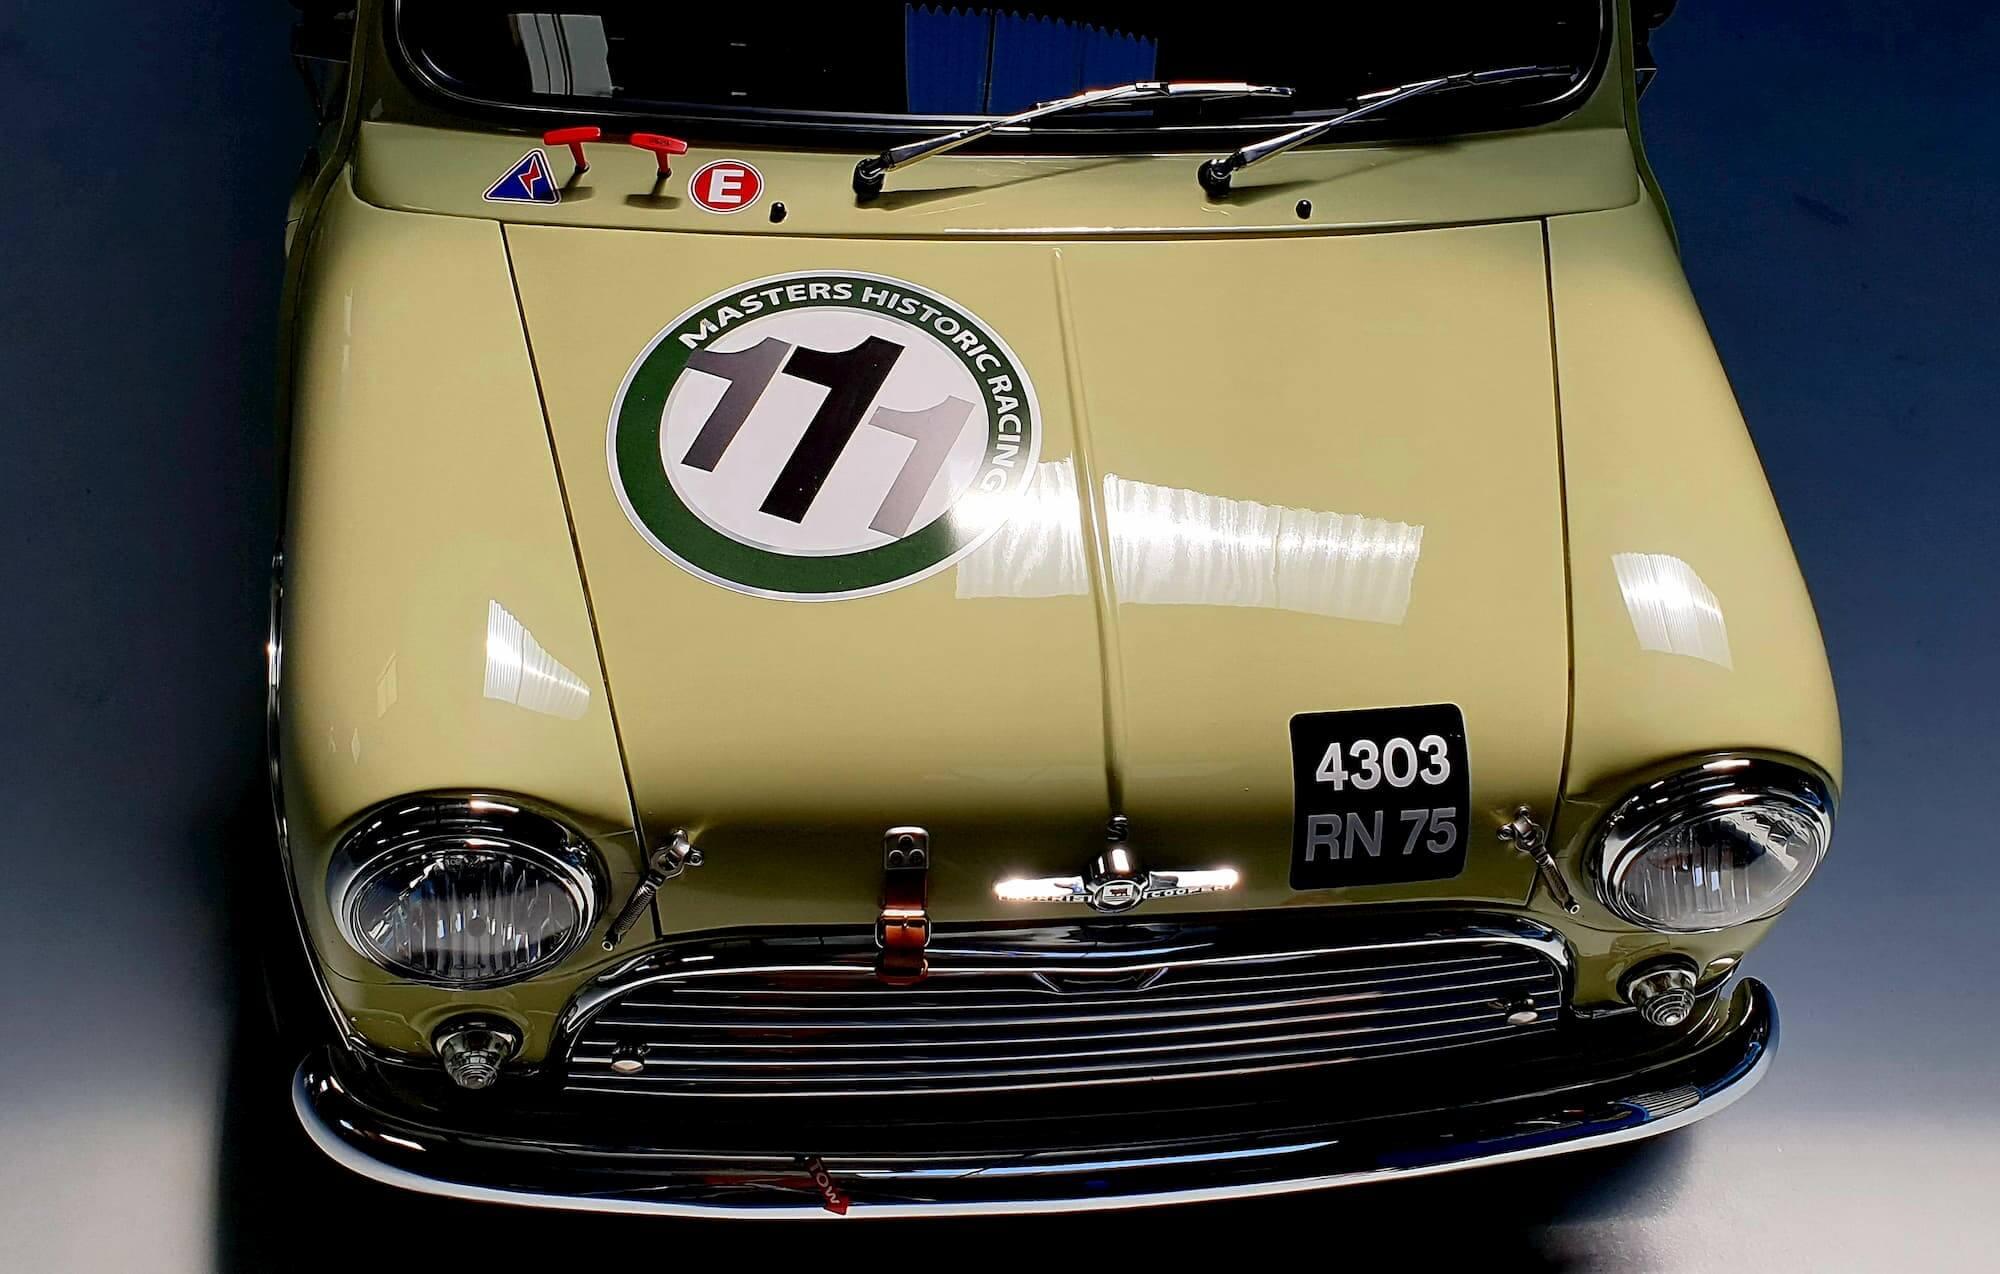 Mini Austin MK1 - refection moteur - Garage des Damiers racing engineering